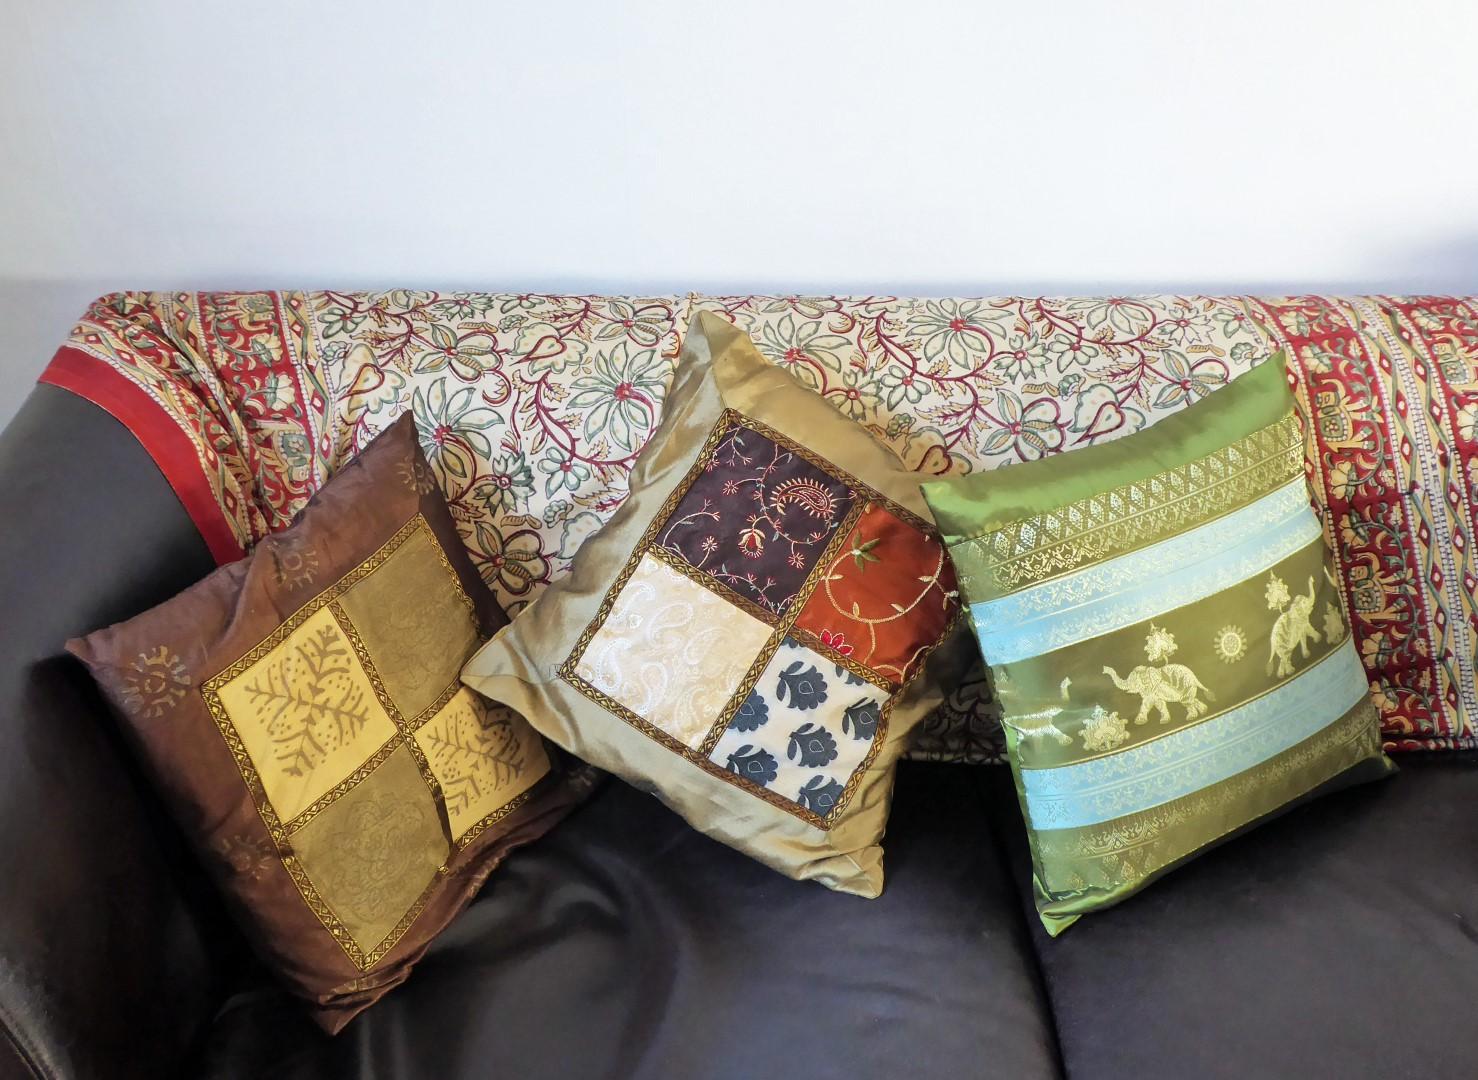 Cushions on a sofa